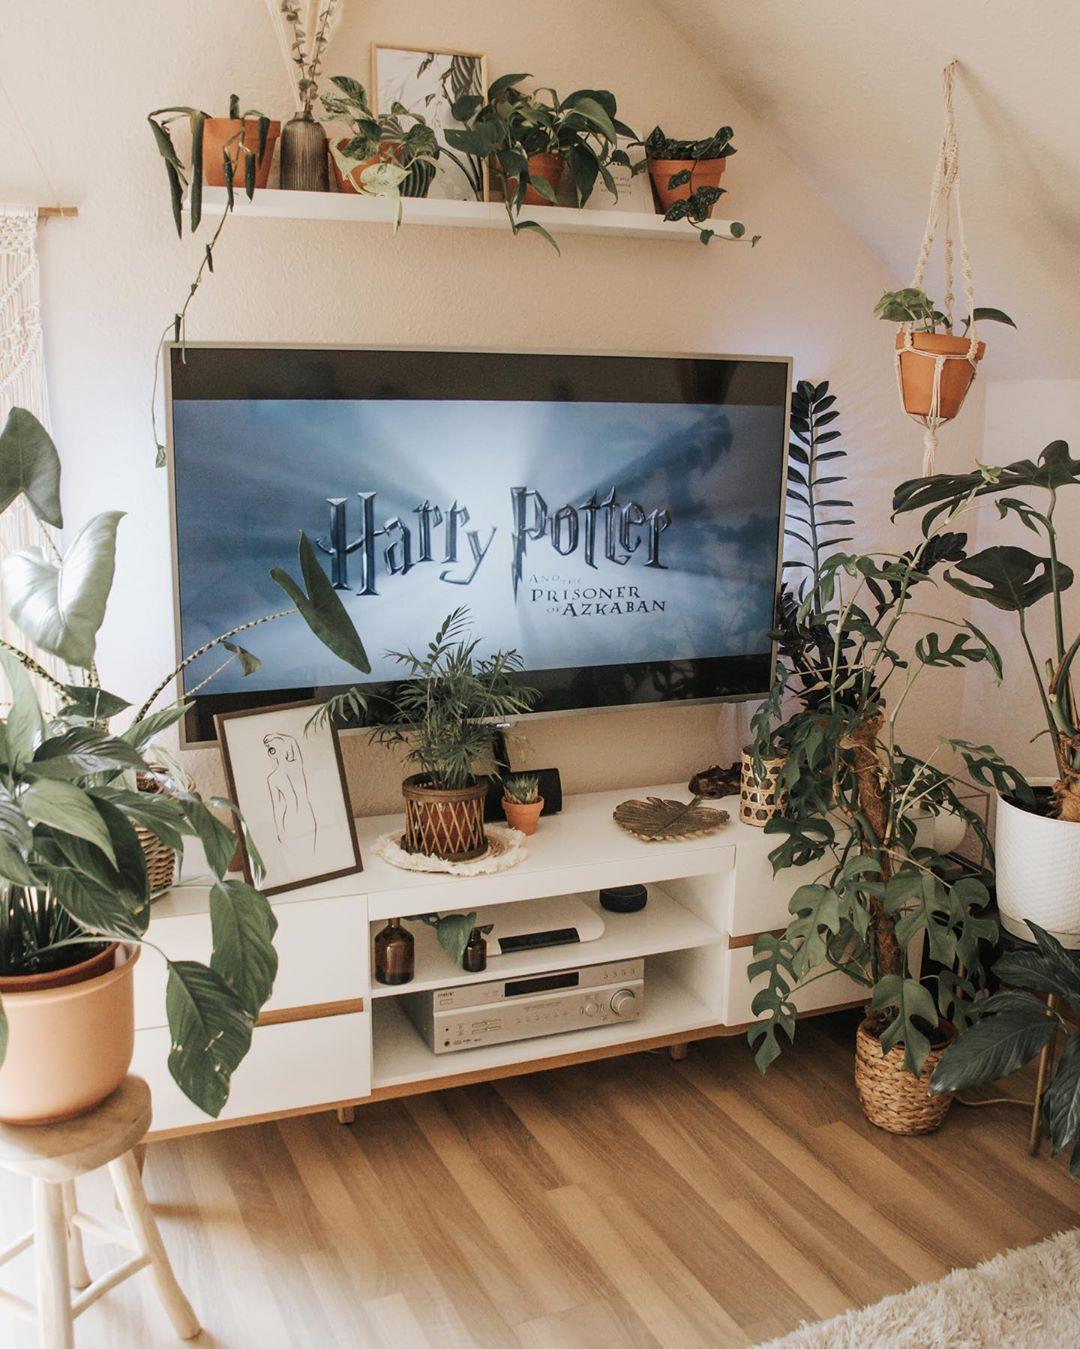 Plants L Interior L Diy On Instagram Zu Welchem Haus In Hogwarts Gehorst Du Werbung Unbeauftragt Harry Potter Room Decor Slytherin Decor Room Ideas Bedroom